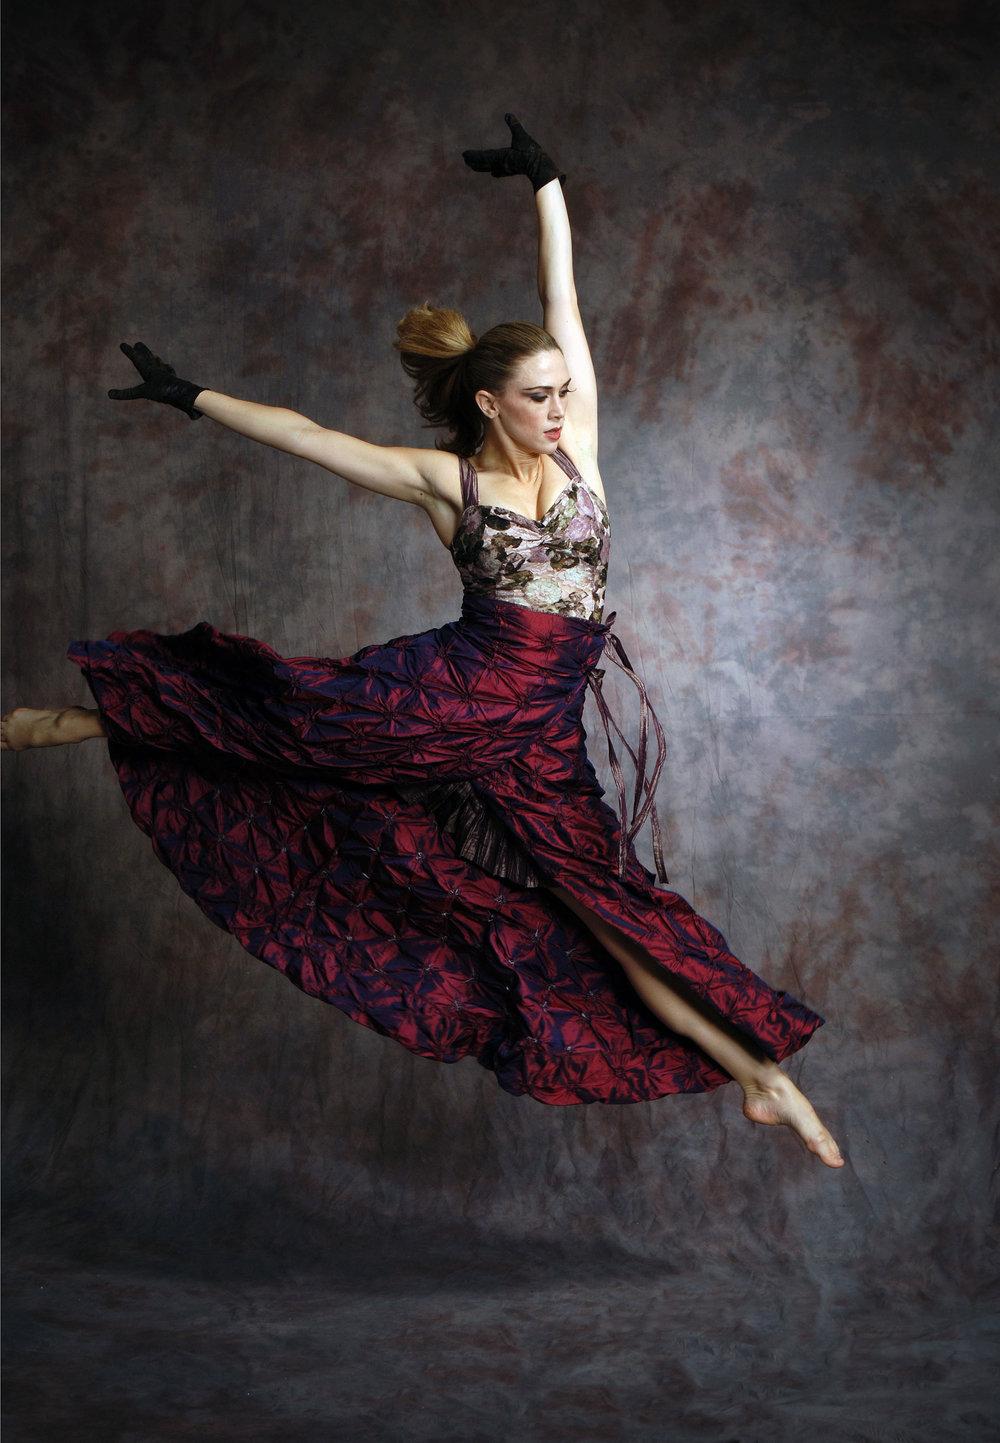 PHOTO: DESIREE DUNBAR BYGREG EHLERS | COURTESY DANCERS DANCING